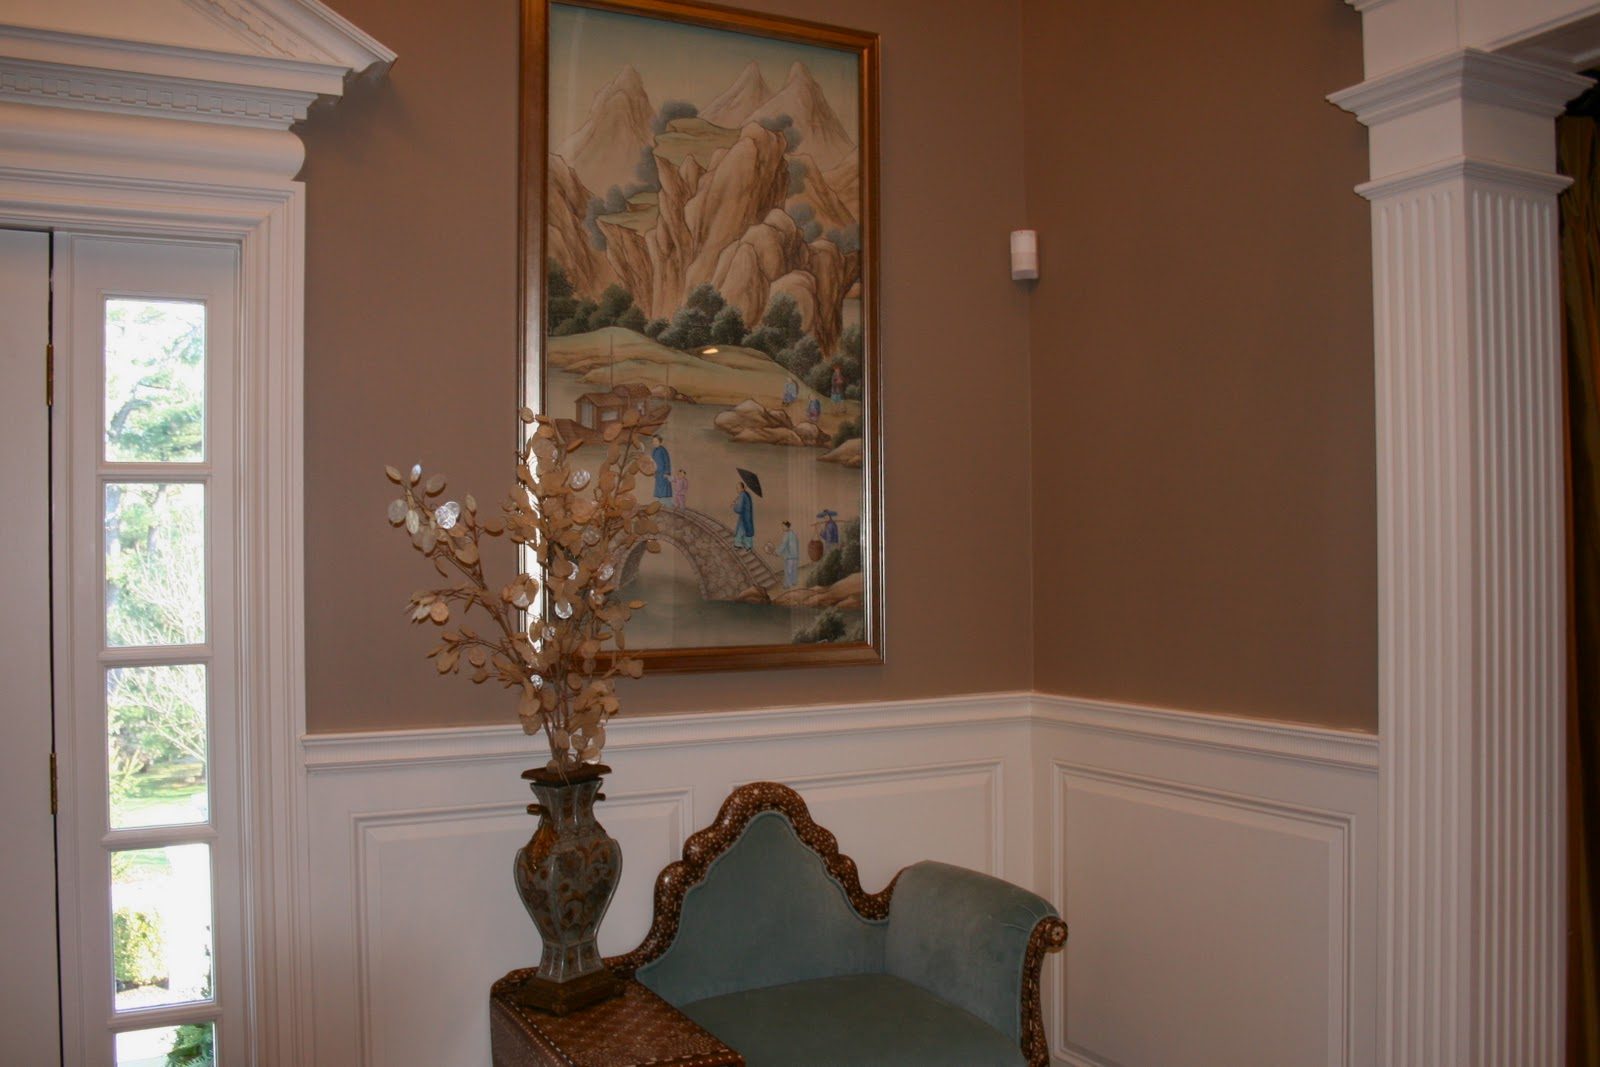 Benjamin moore paint san diego - Walls Bm Alexandria Beige 50 Formula Hc 77 Trim Woodwork Bm White Dove Oc 17